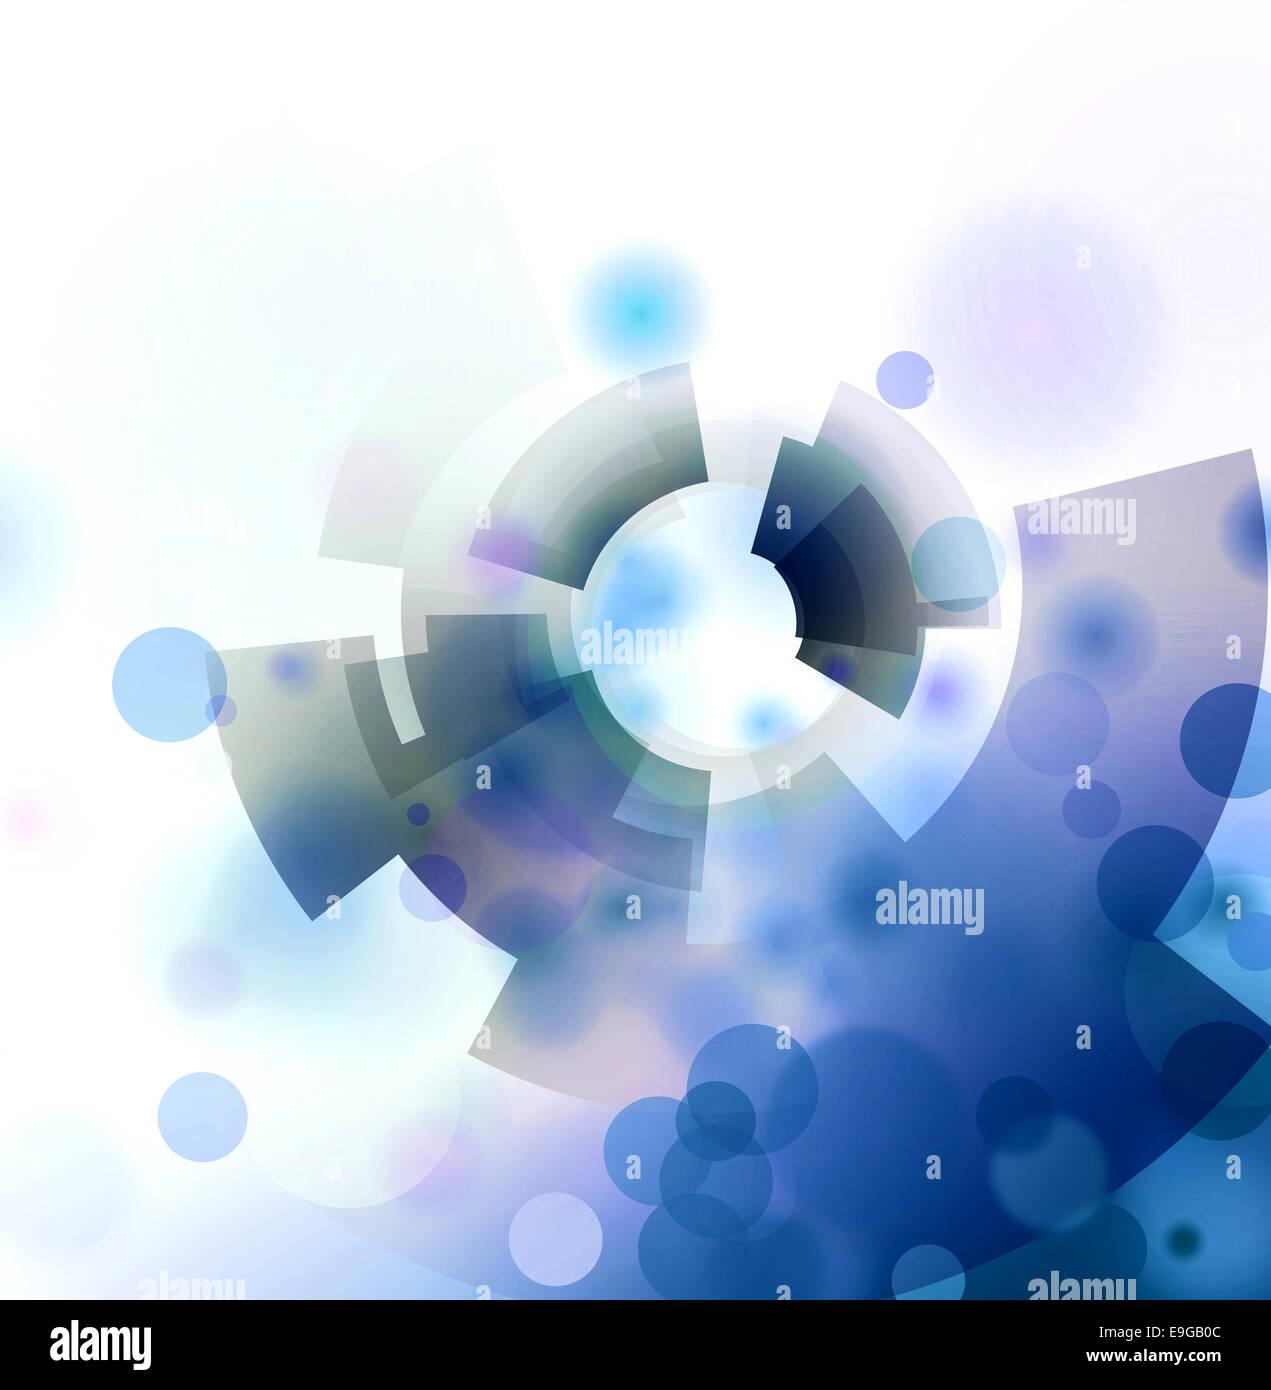 Abstract background scientifico Immagini Stock